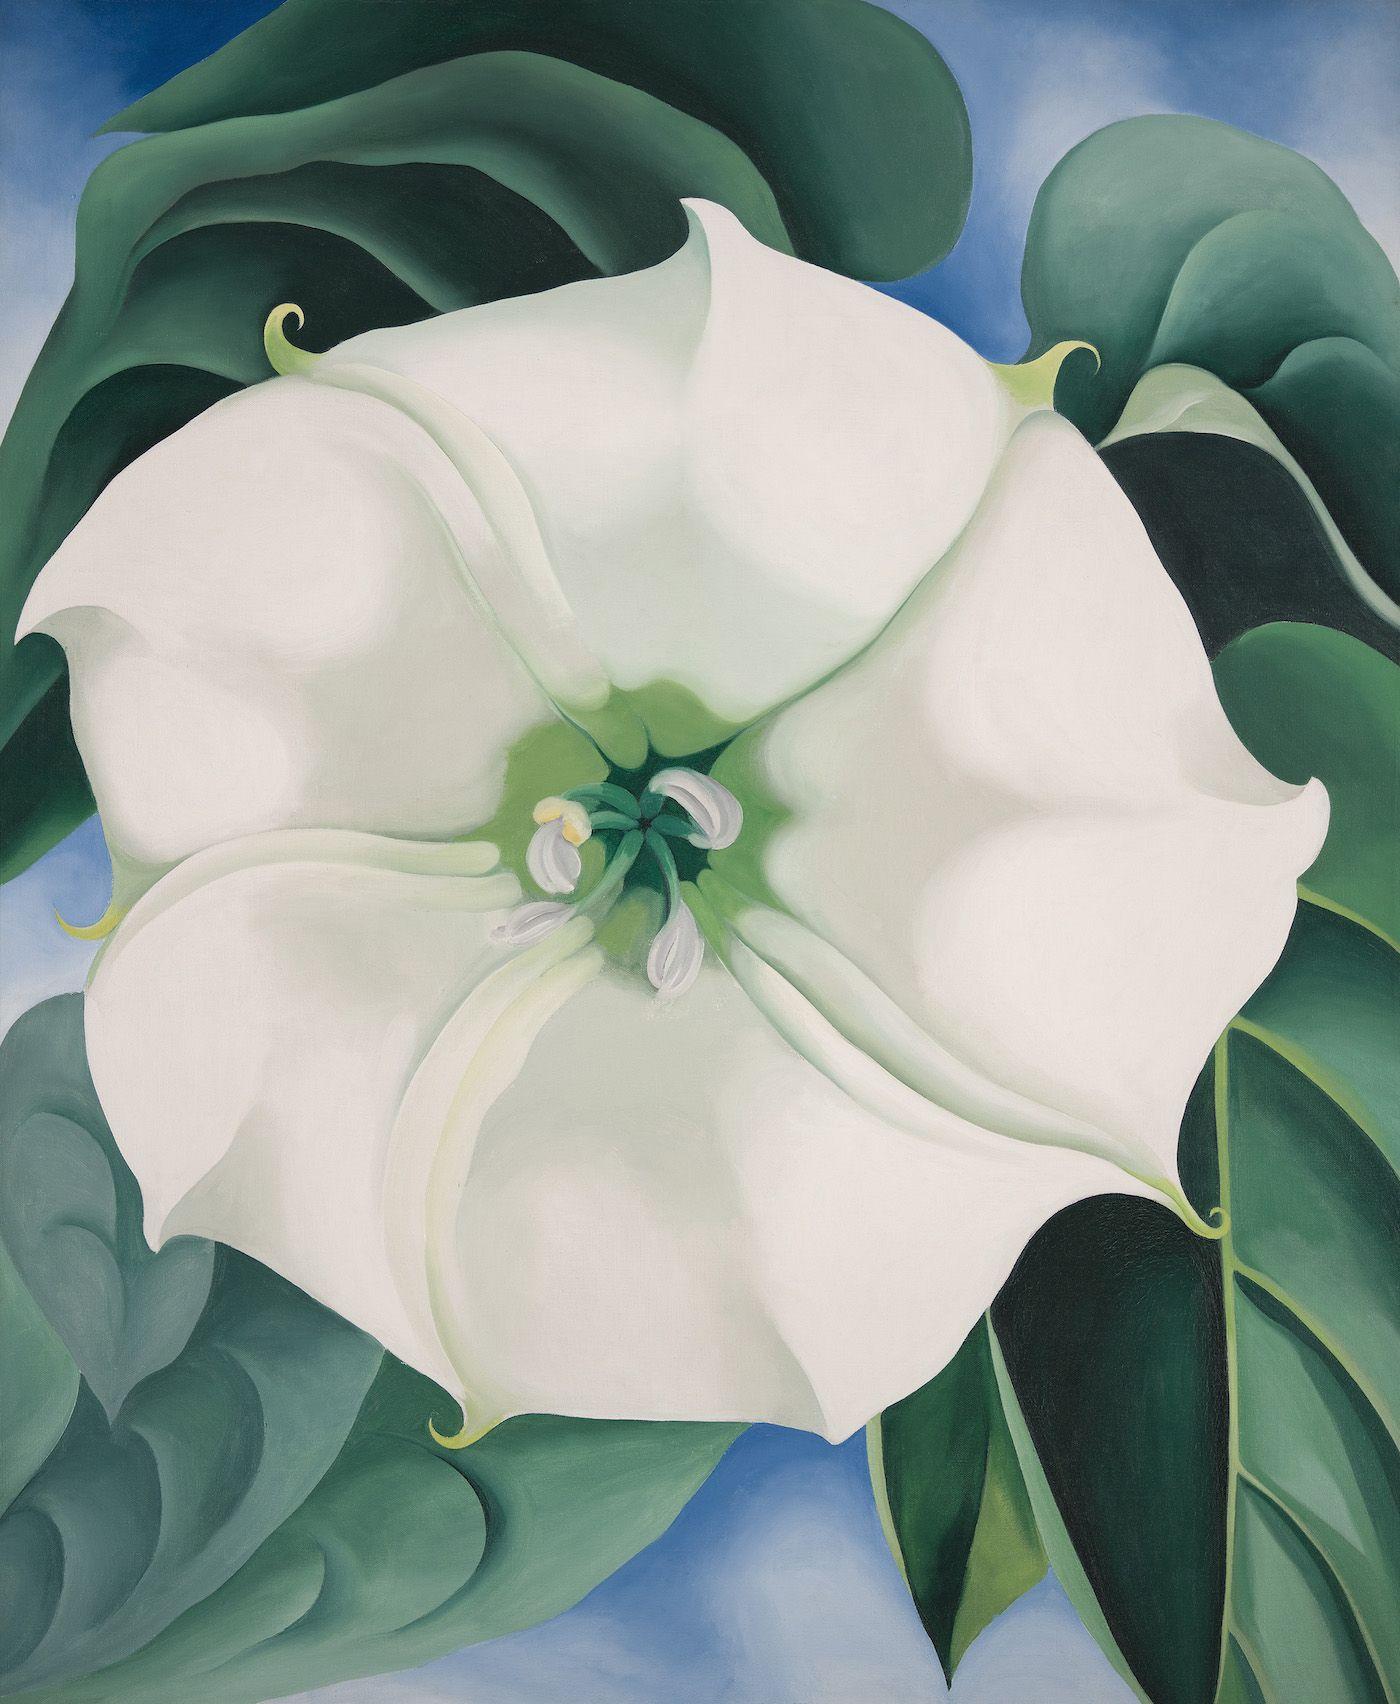 201435 Georgia Okeeffe Jimson Weedwhite Flower No 1 1932 Oil On